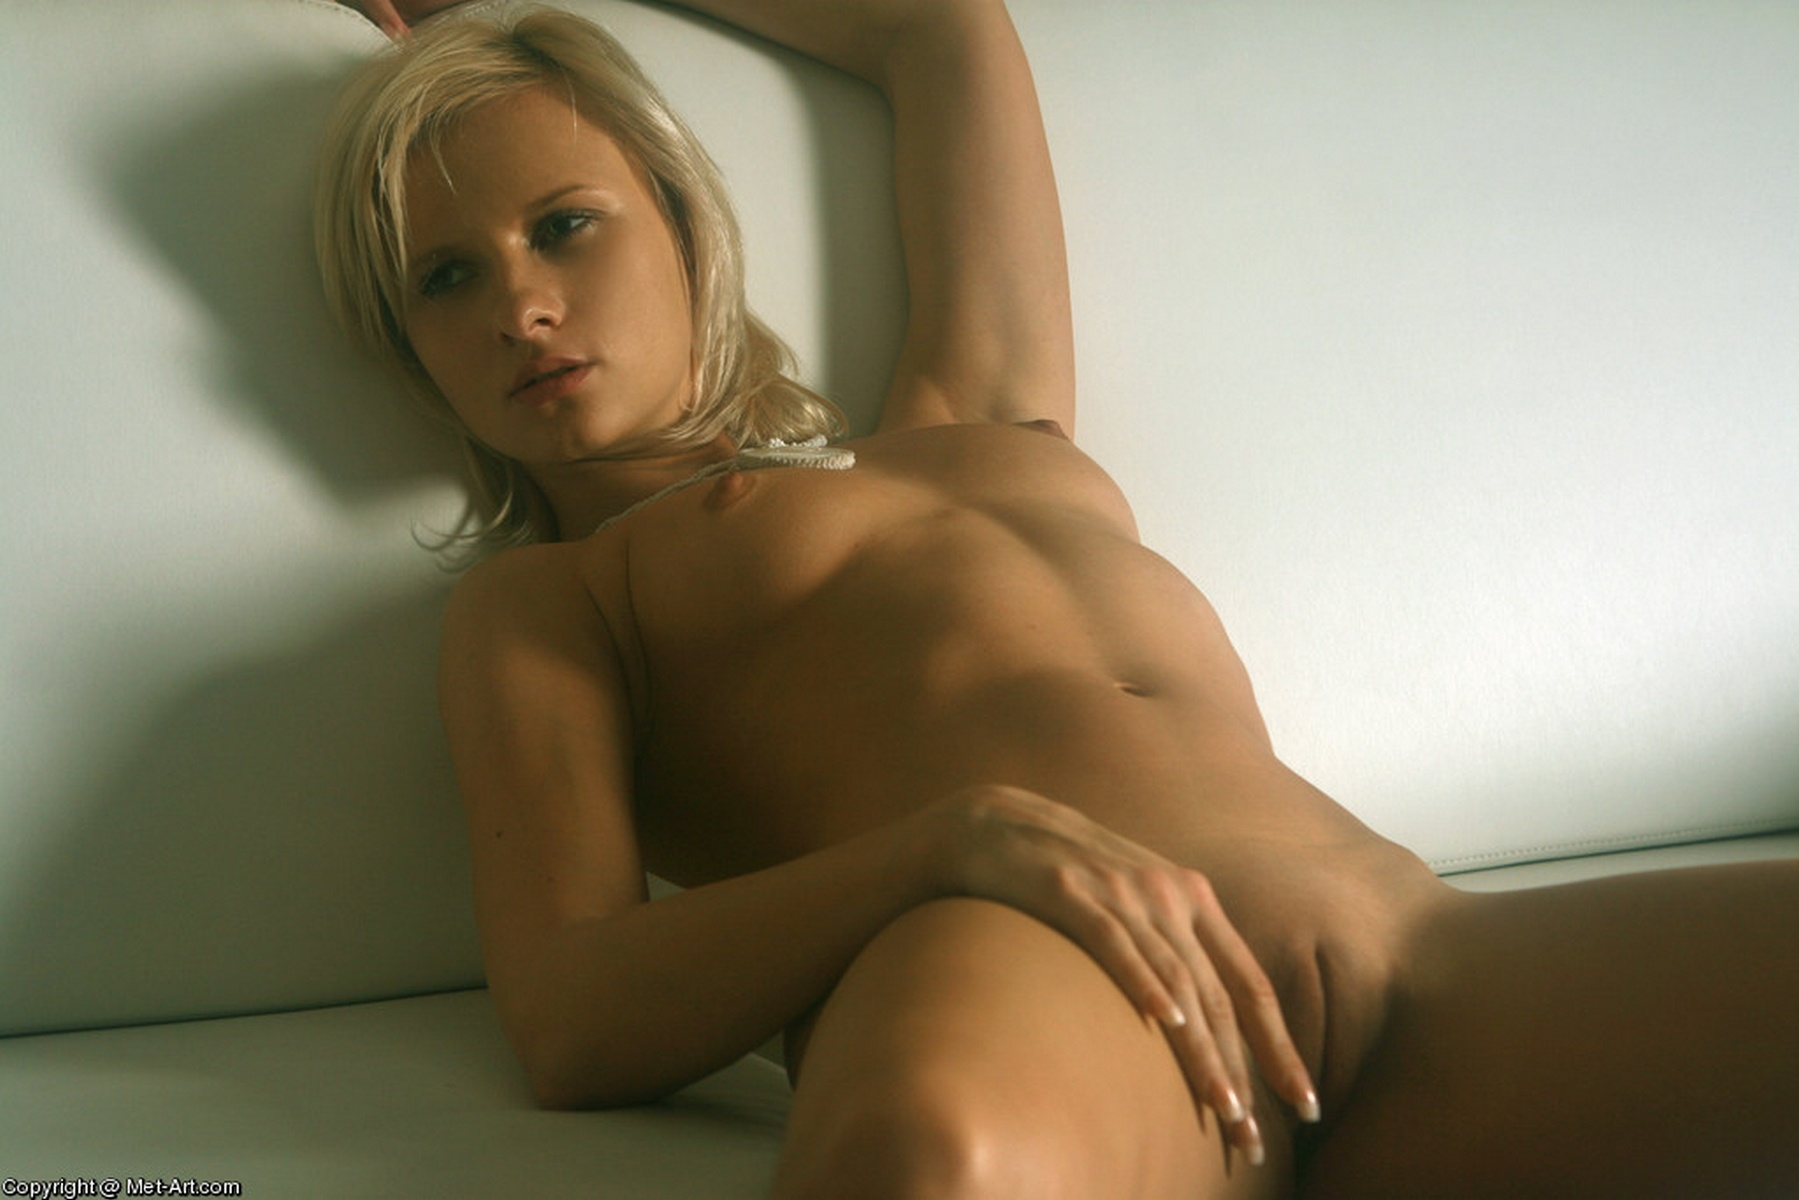 Wallpaper Erotic, Sexy, Nude, Beautiful, Blonde, Hot Body -3018